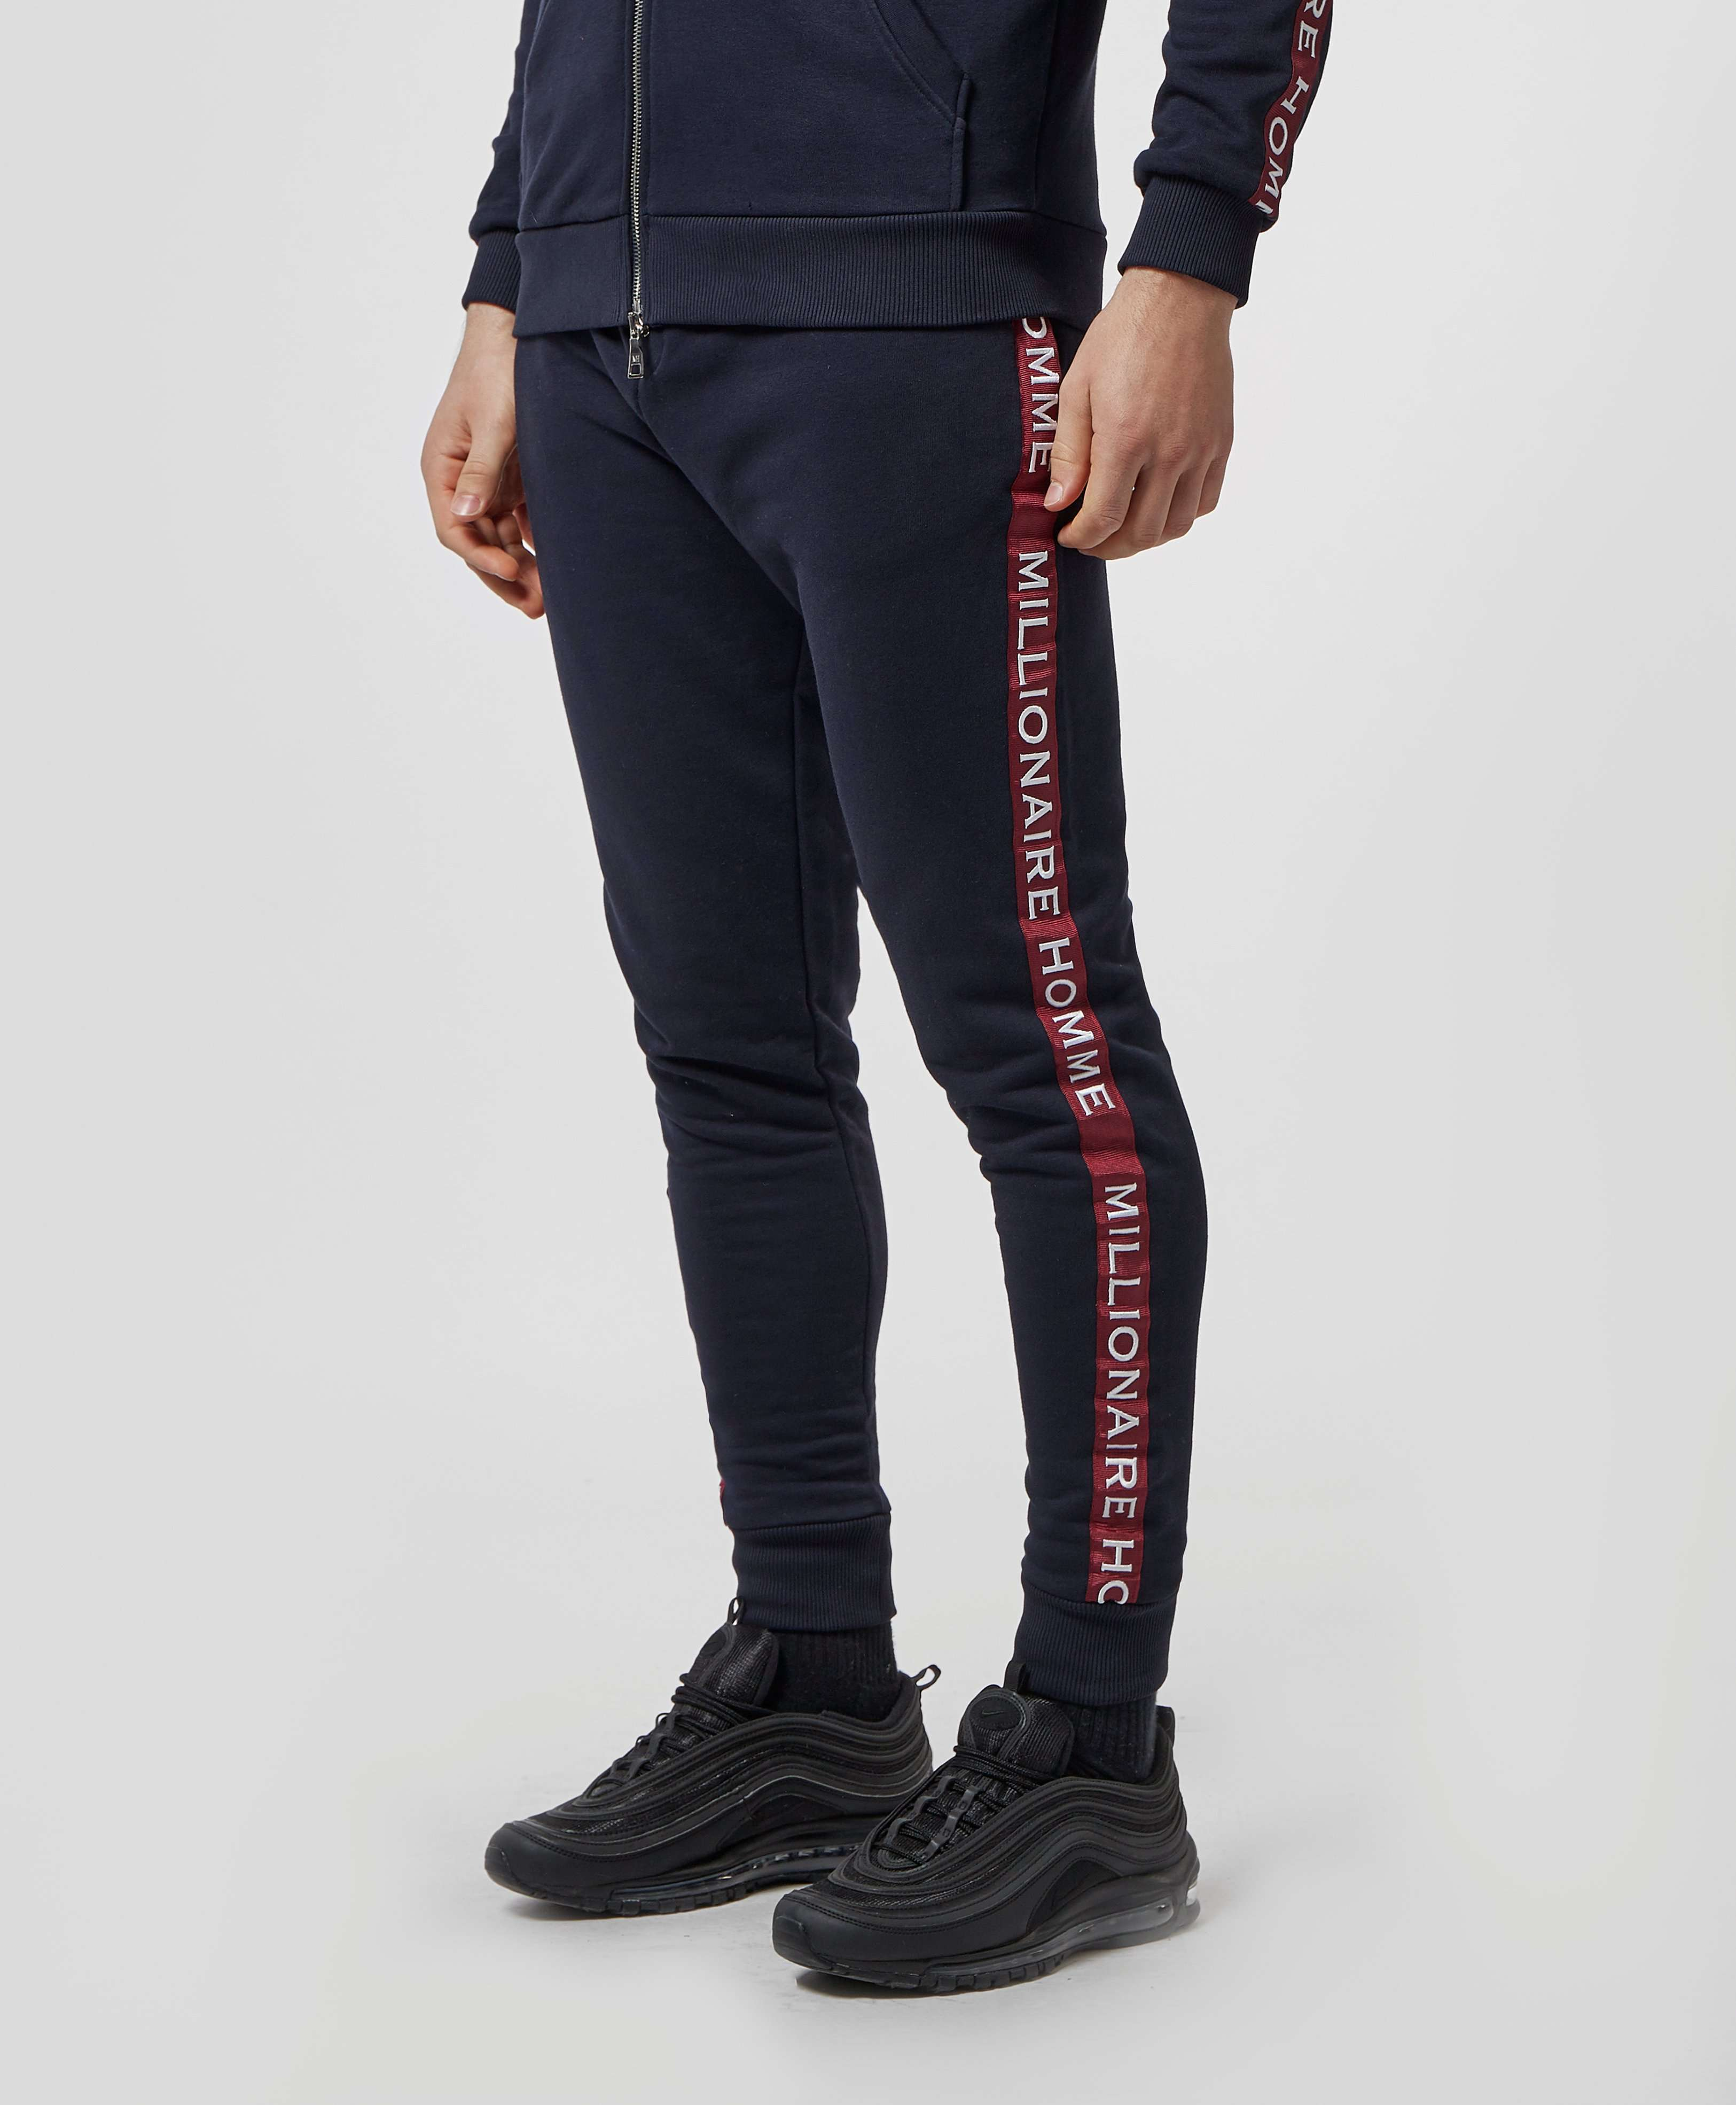 Millionaire Homme Tape Logo Fleece Pants - Online Exclusive